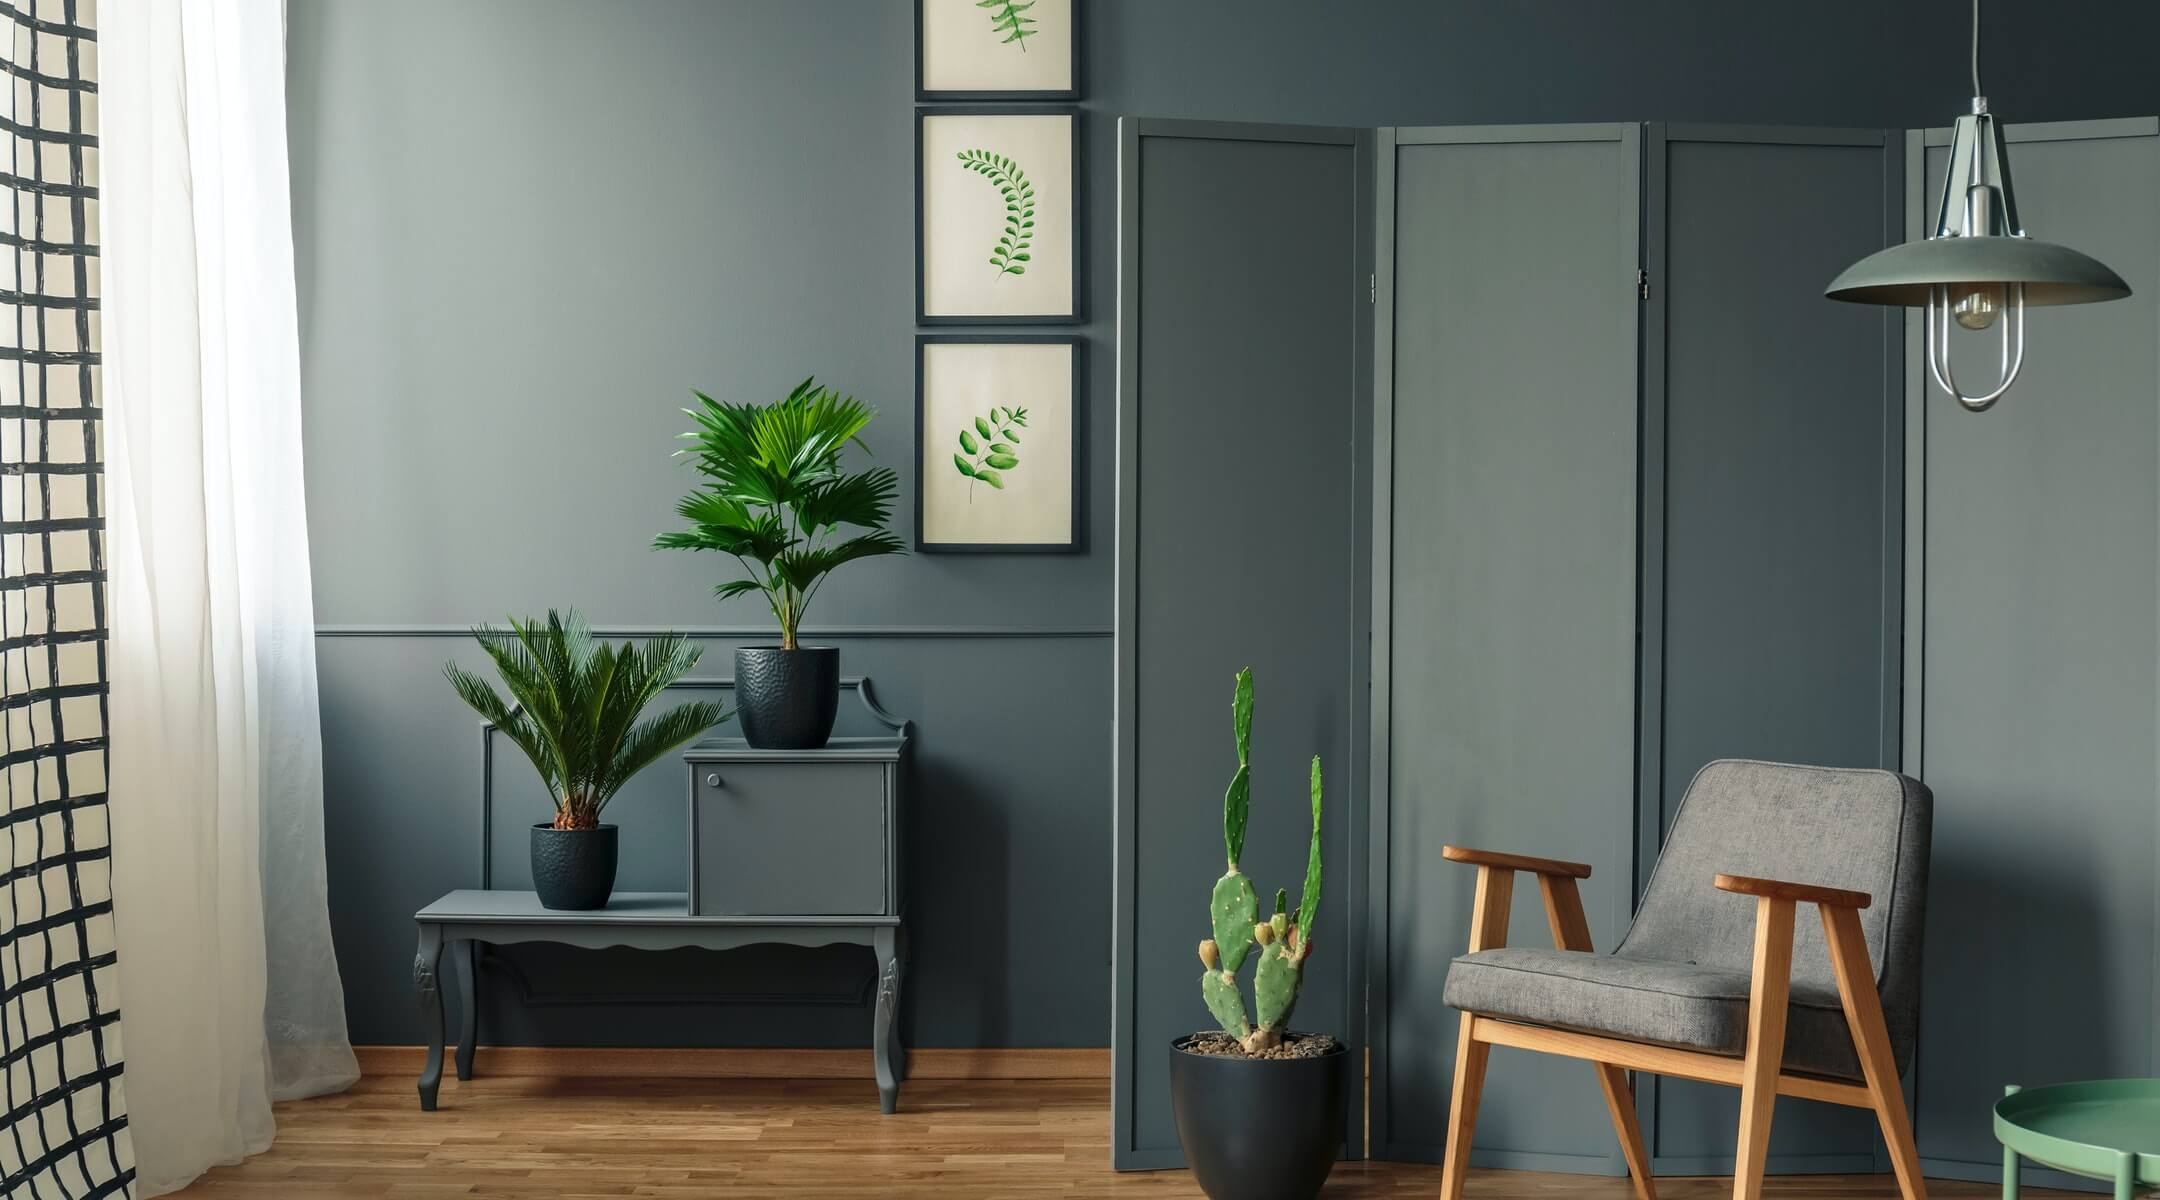 How Guys Can Decorate Their Dorm Rooms 10 Creative Decor Ideas